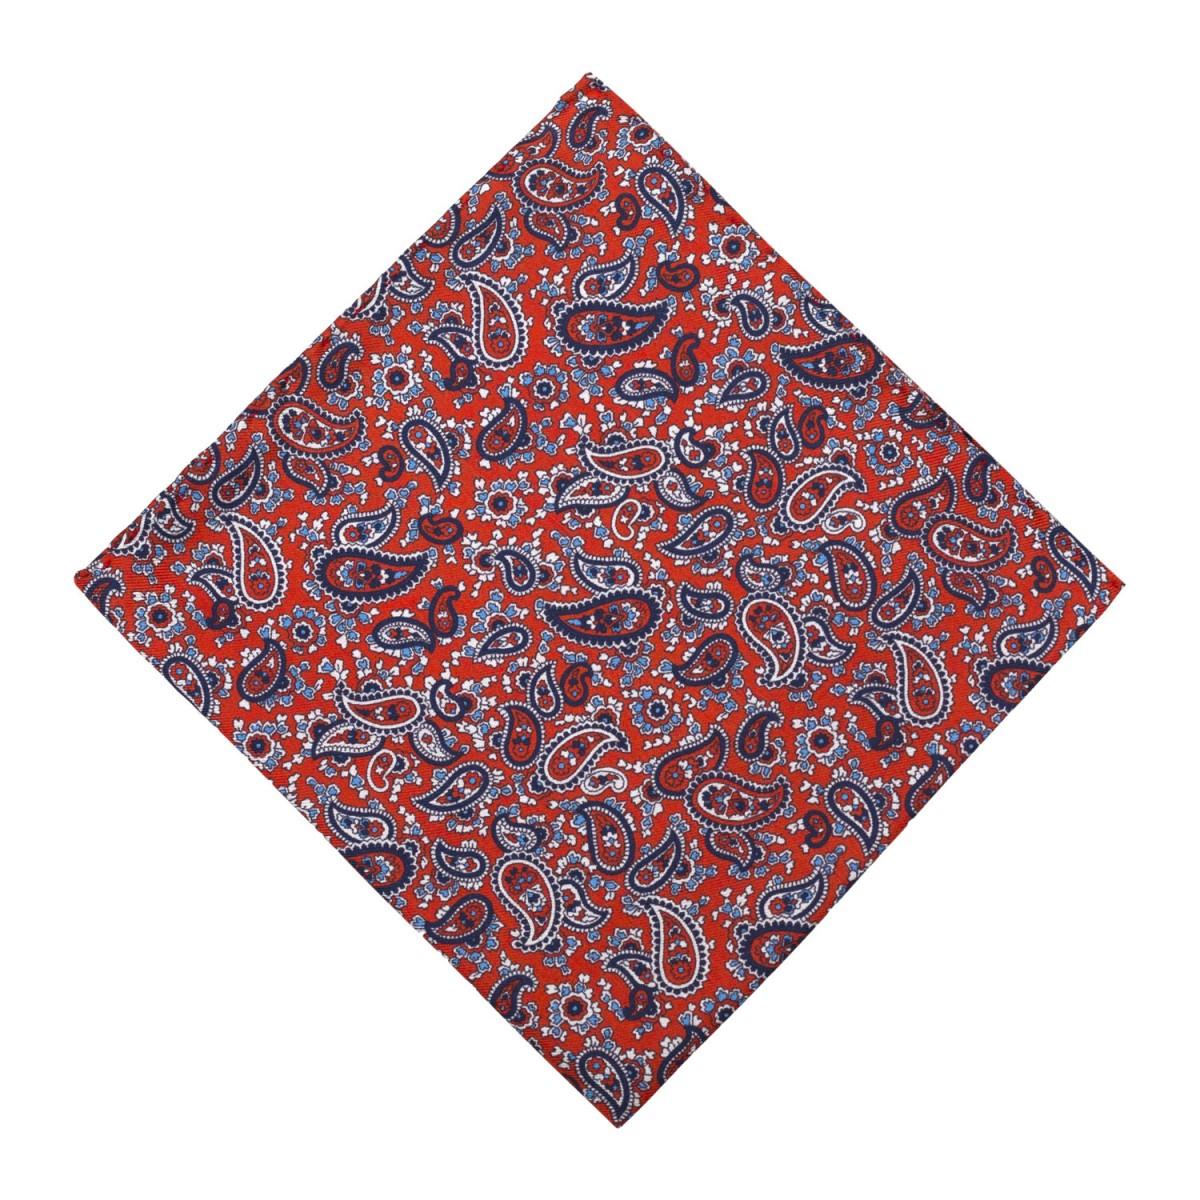 Panuelo-Rojo-Cachemires-Azules